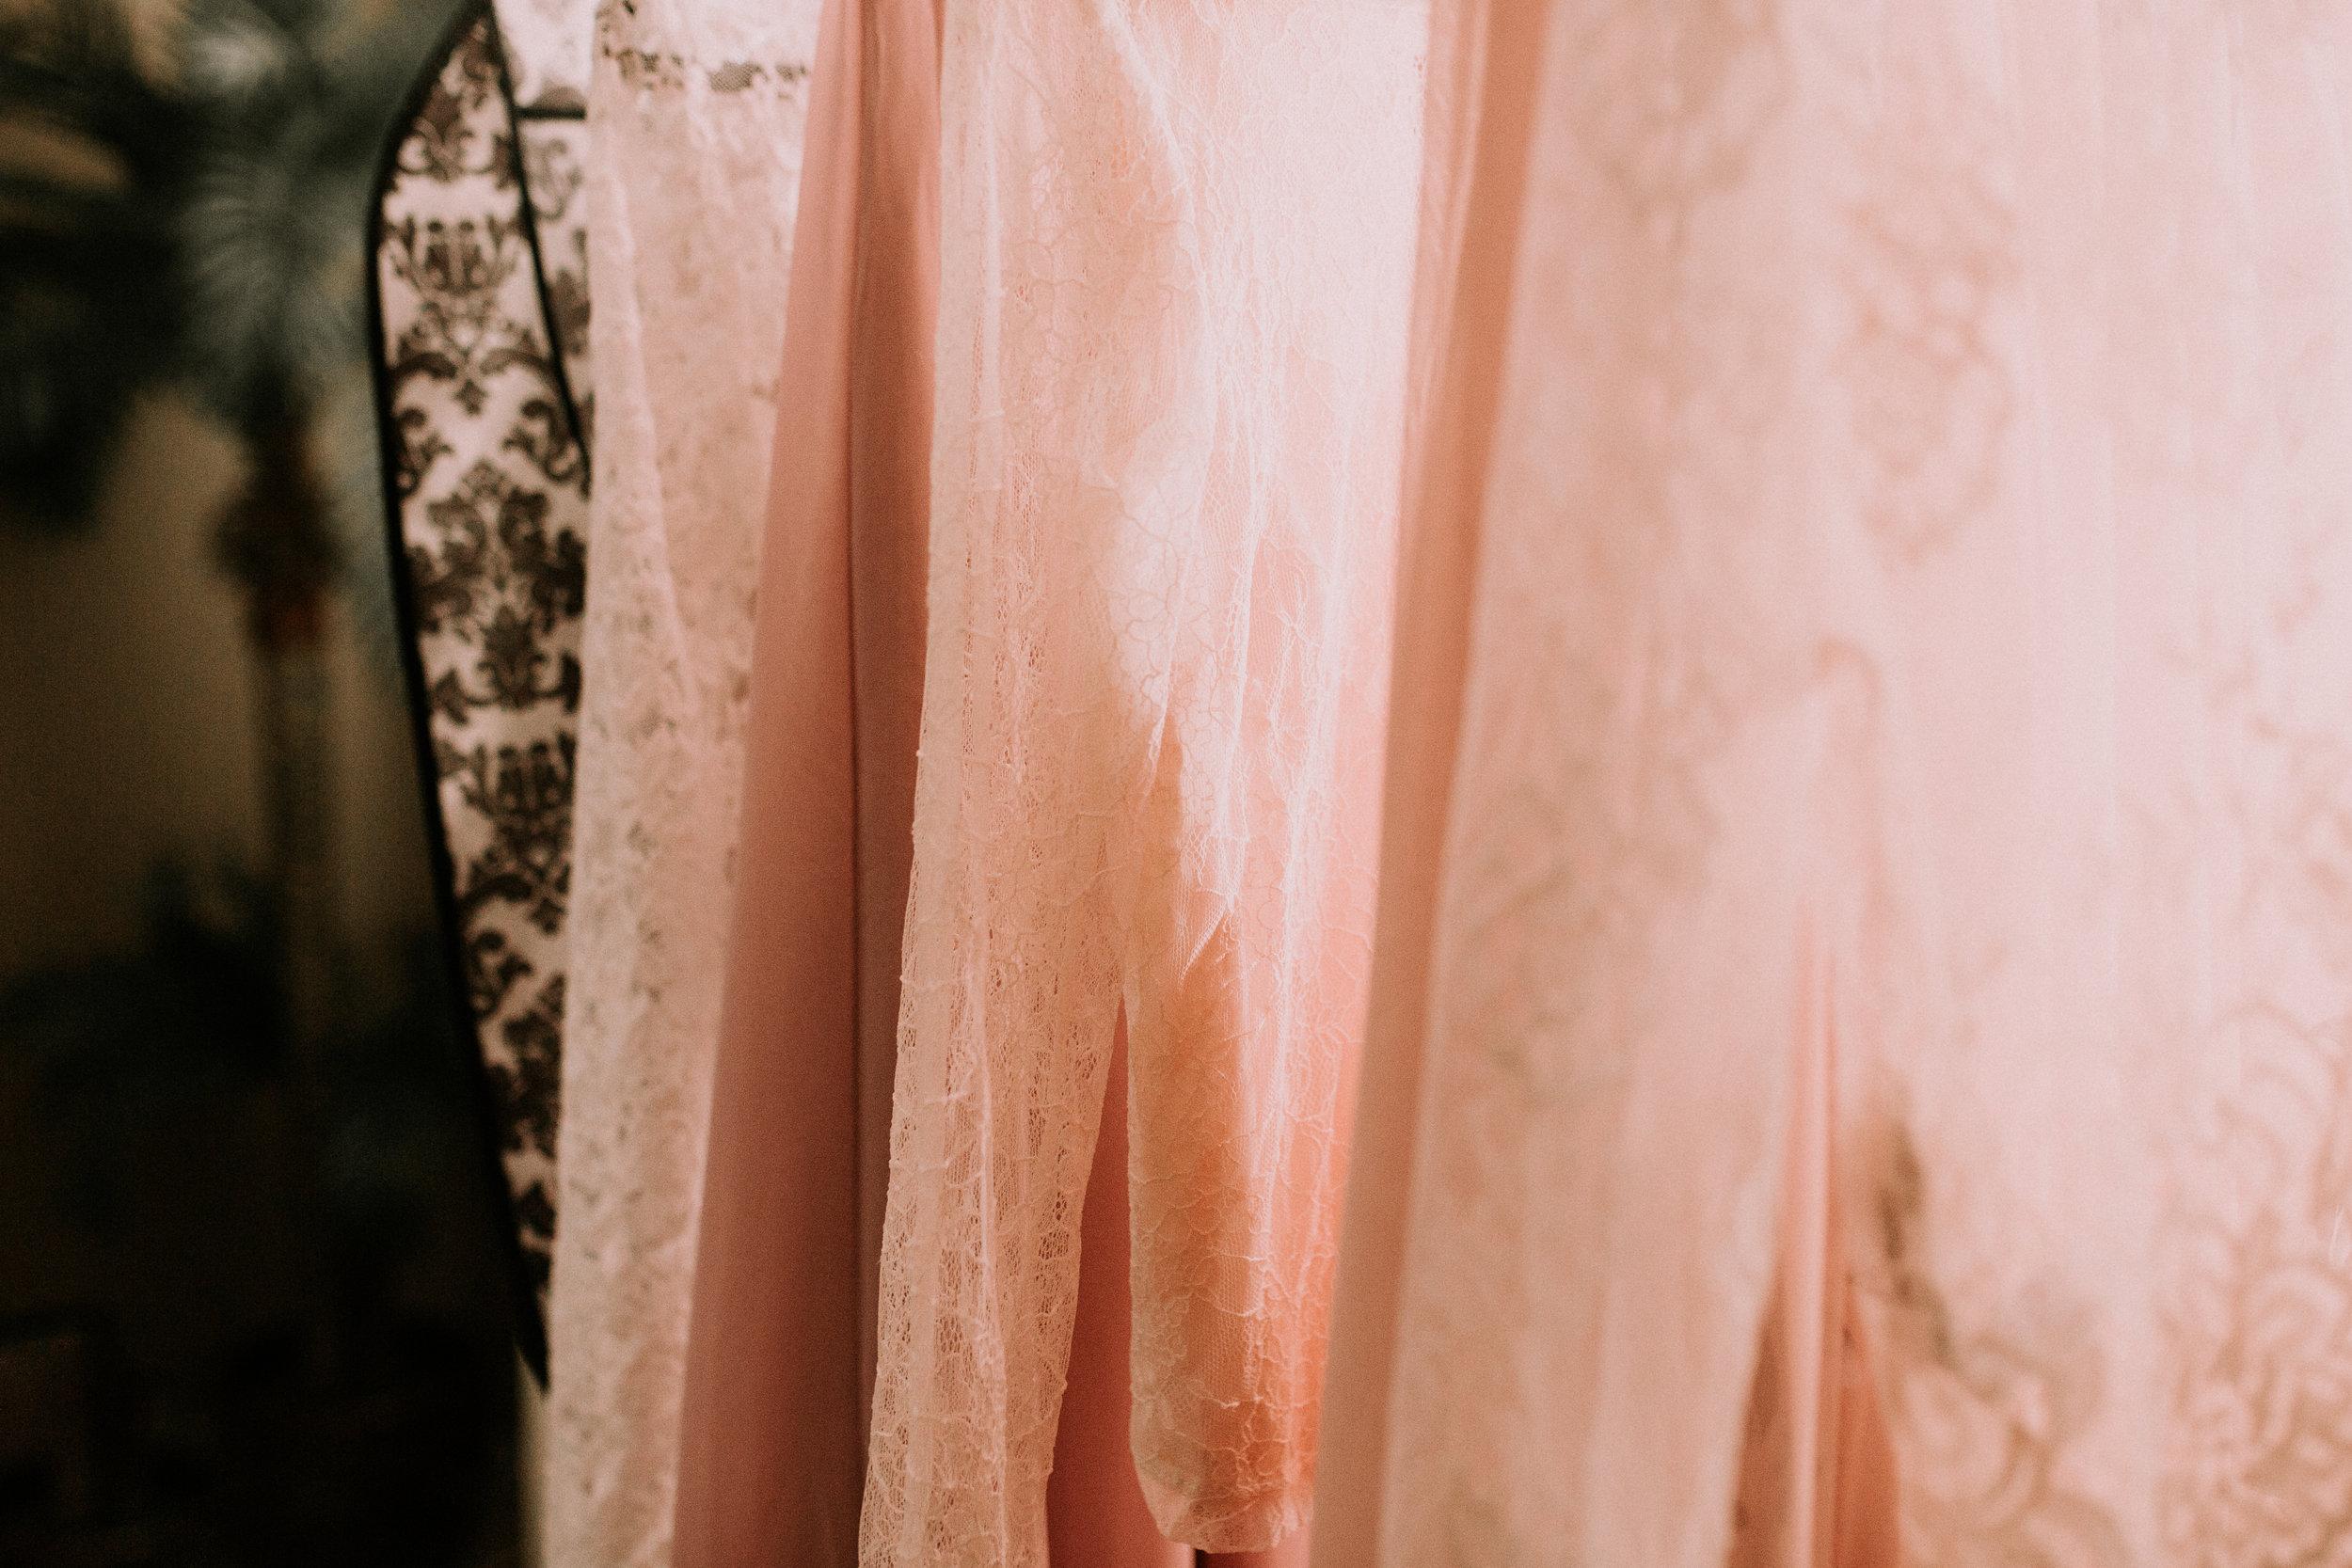 Jessica + Daniel - Kamra Fuller Photography - Henderson, NV - Las Vegas Wedding Photographer - Seattle Wedding Photographer - Portland Elopement Photographer - Portland Wedding Photographer - Wedding Details - Ring Shot - Detail Shot - Candid - Lifestyle - Documentary Style Photography - Wedding Photojournalist - PNW Elopement Photographer - White Lace Wedding Dress - Moody Photography - Bride - Groom - Getting Ready